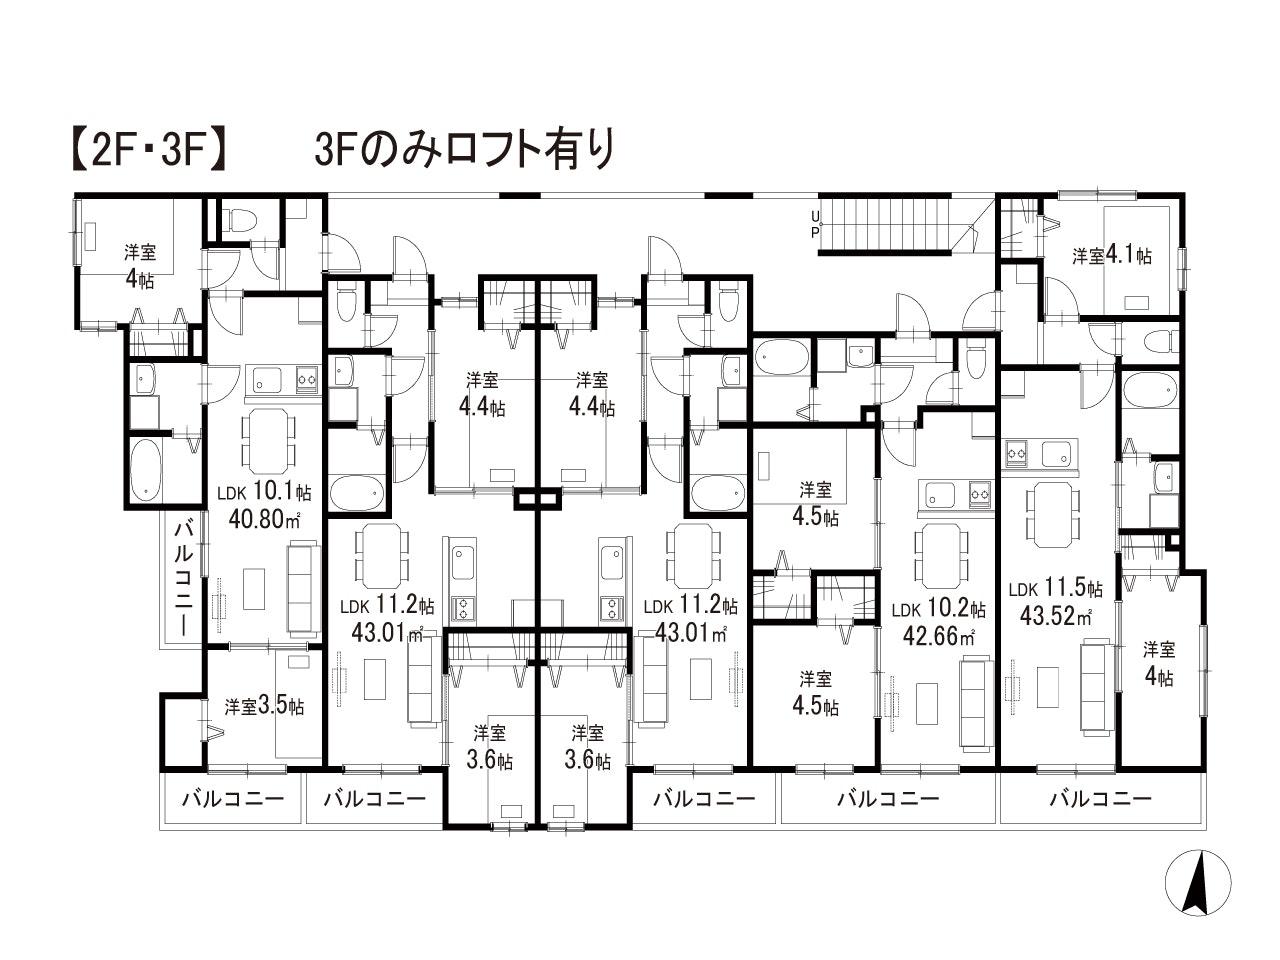 b1053_plan_002.jpg